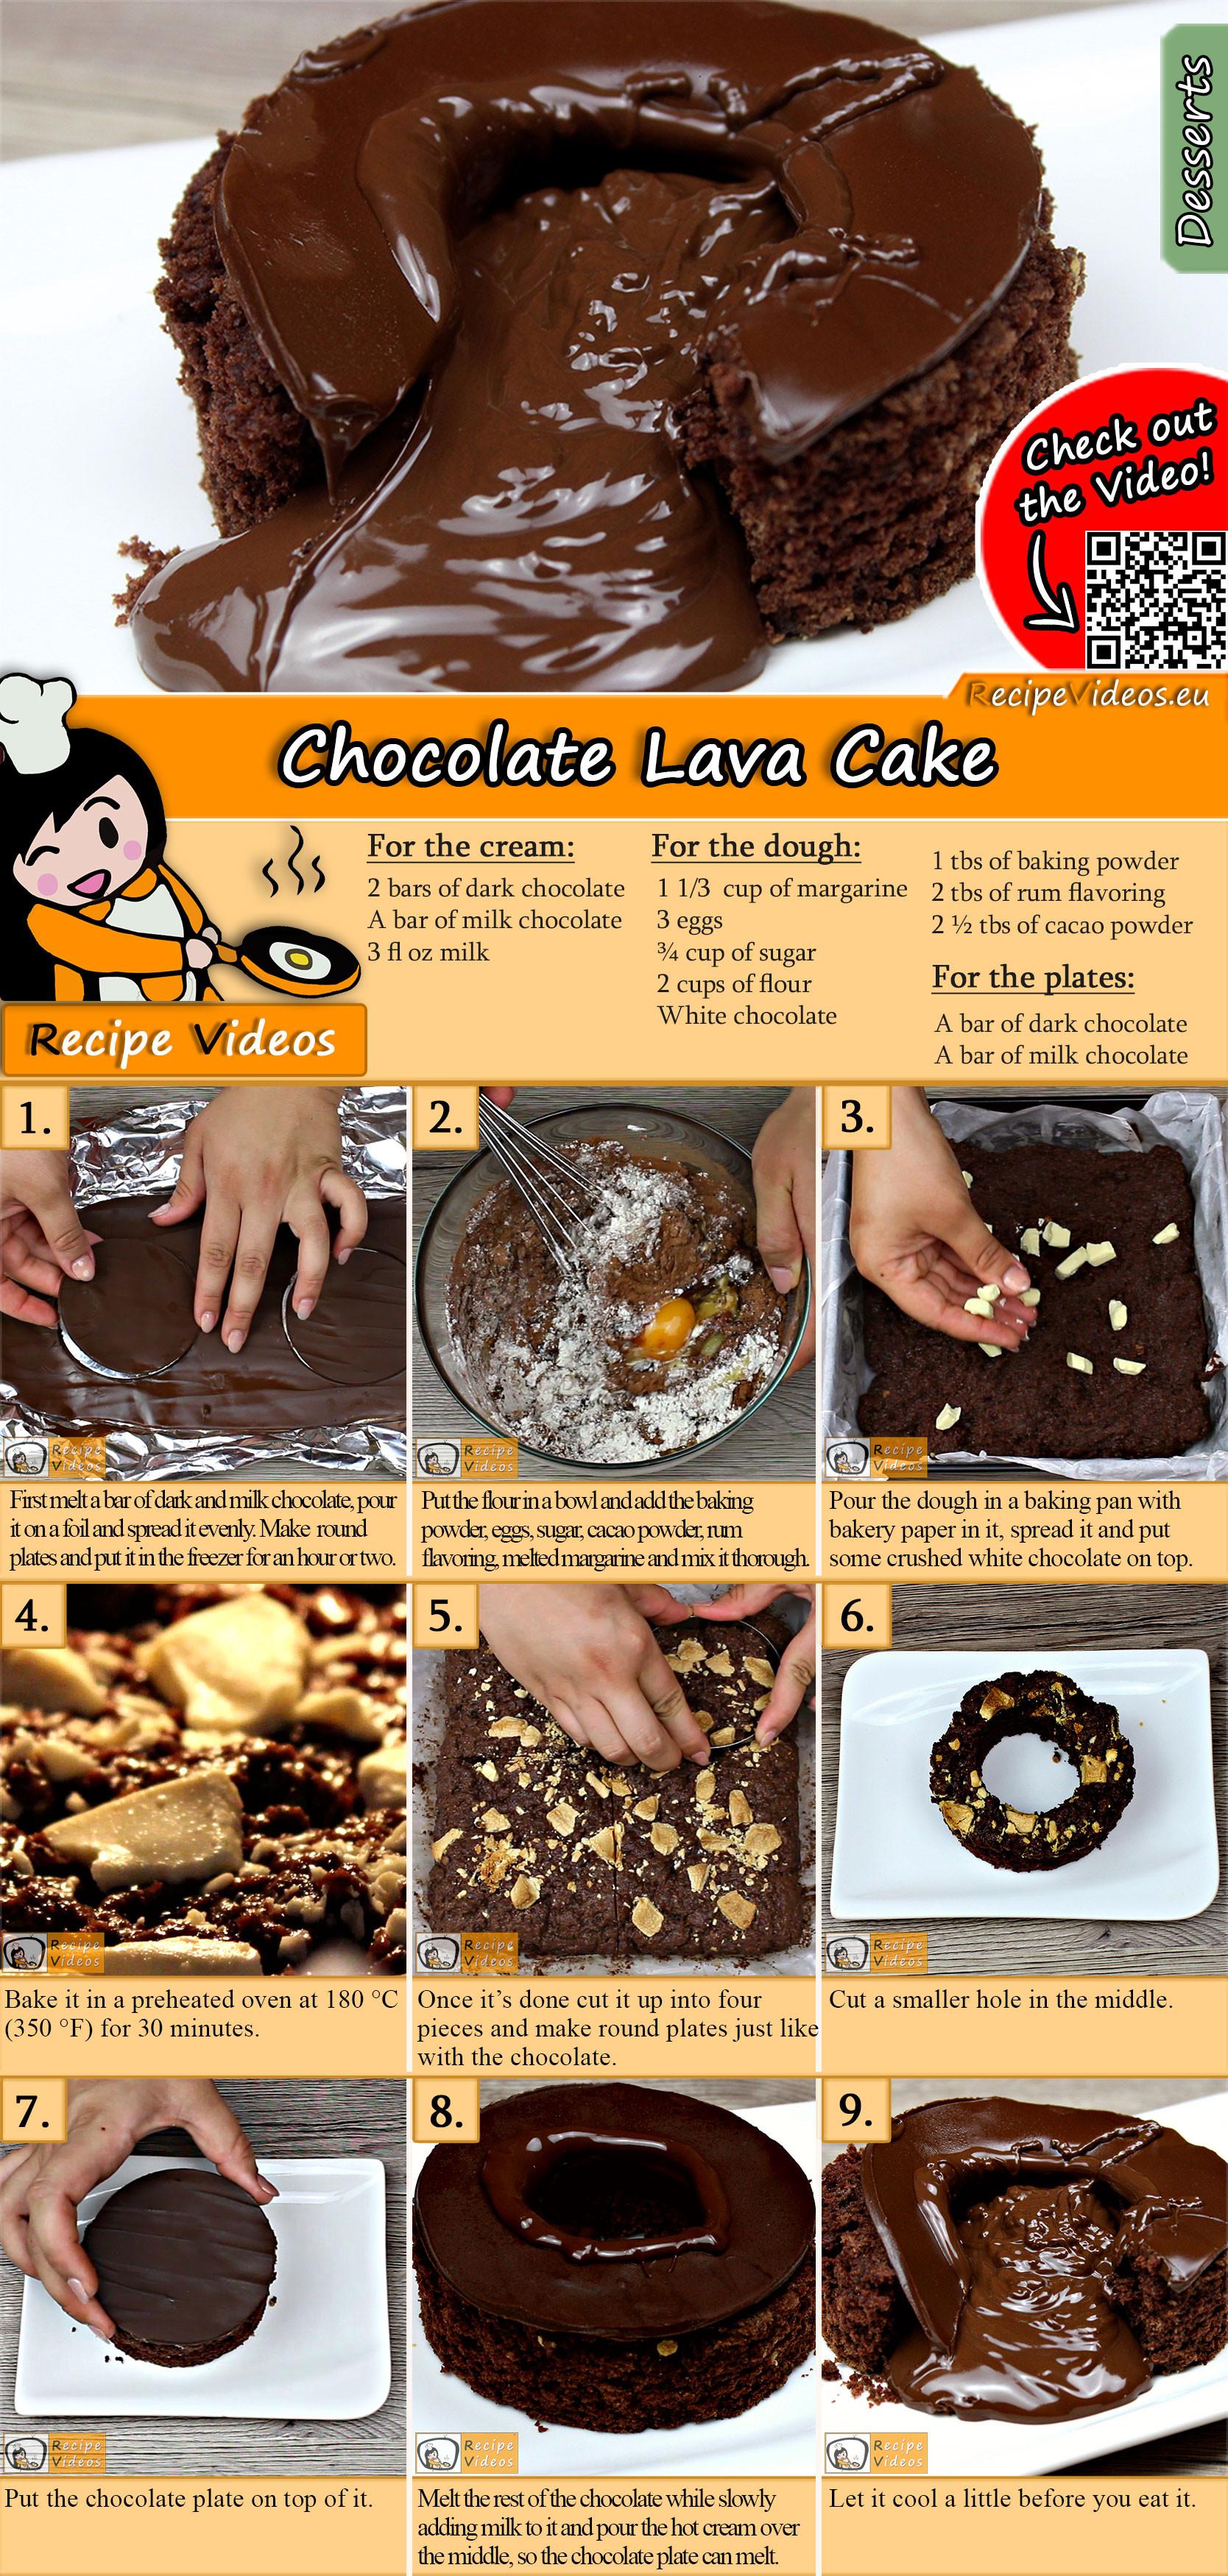 Chocolate Lava Cake recipe with video